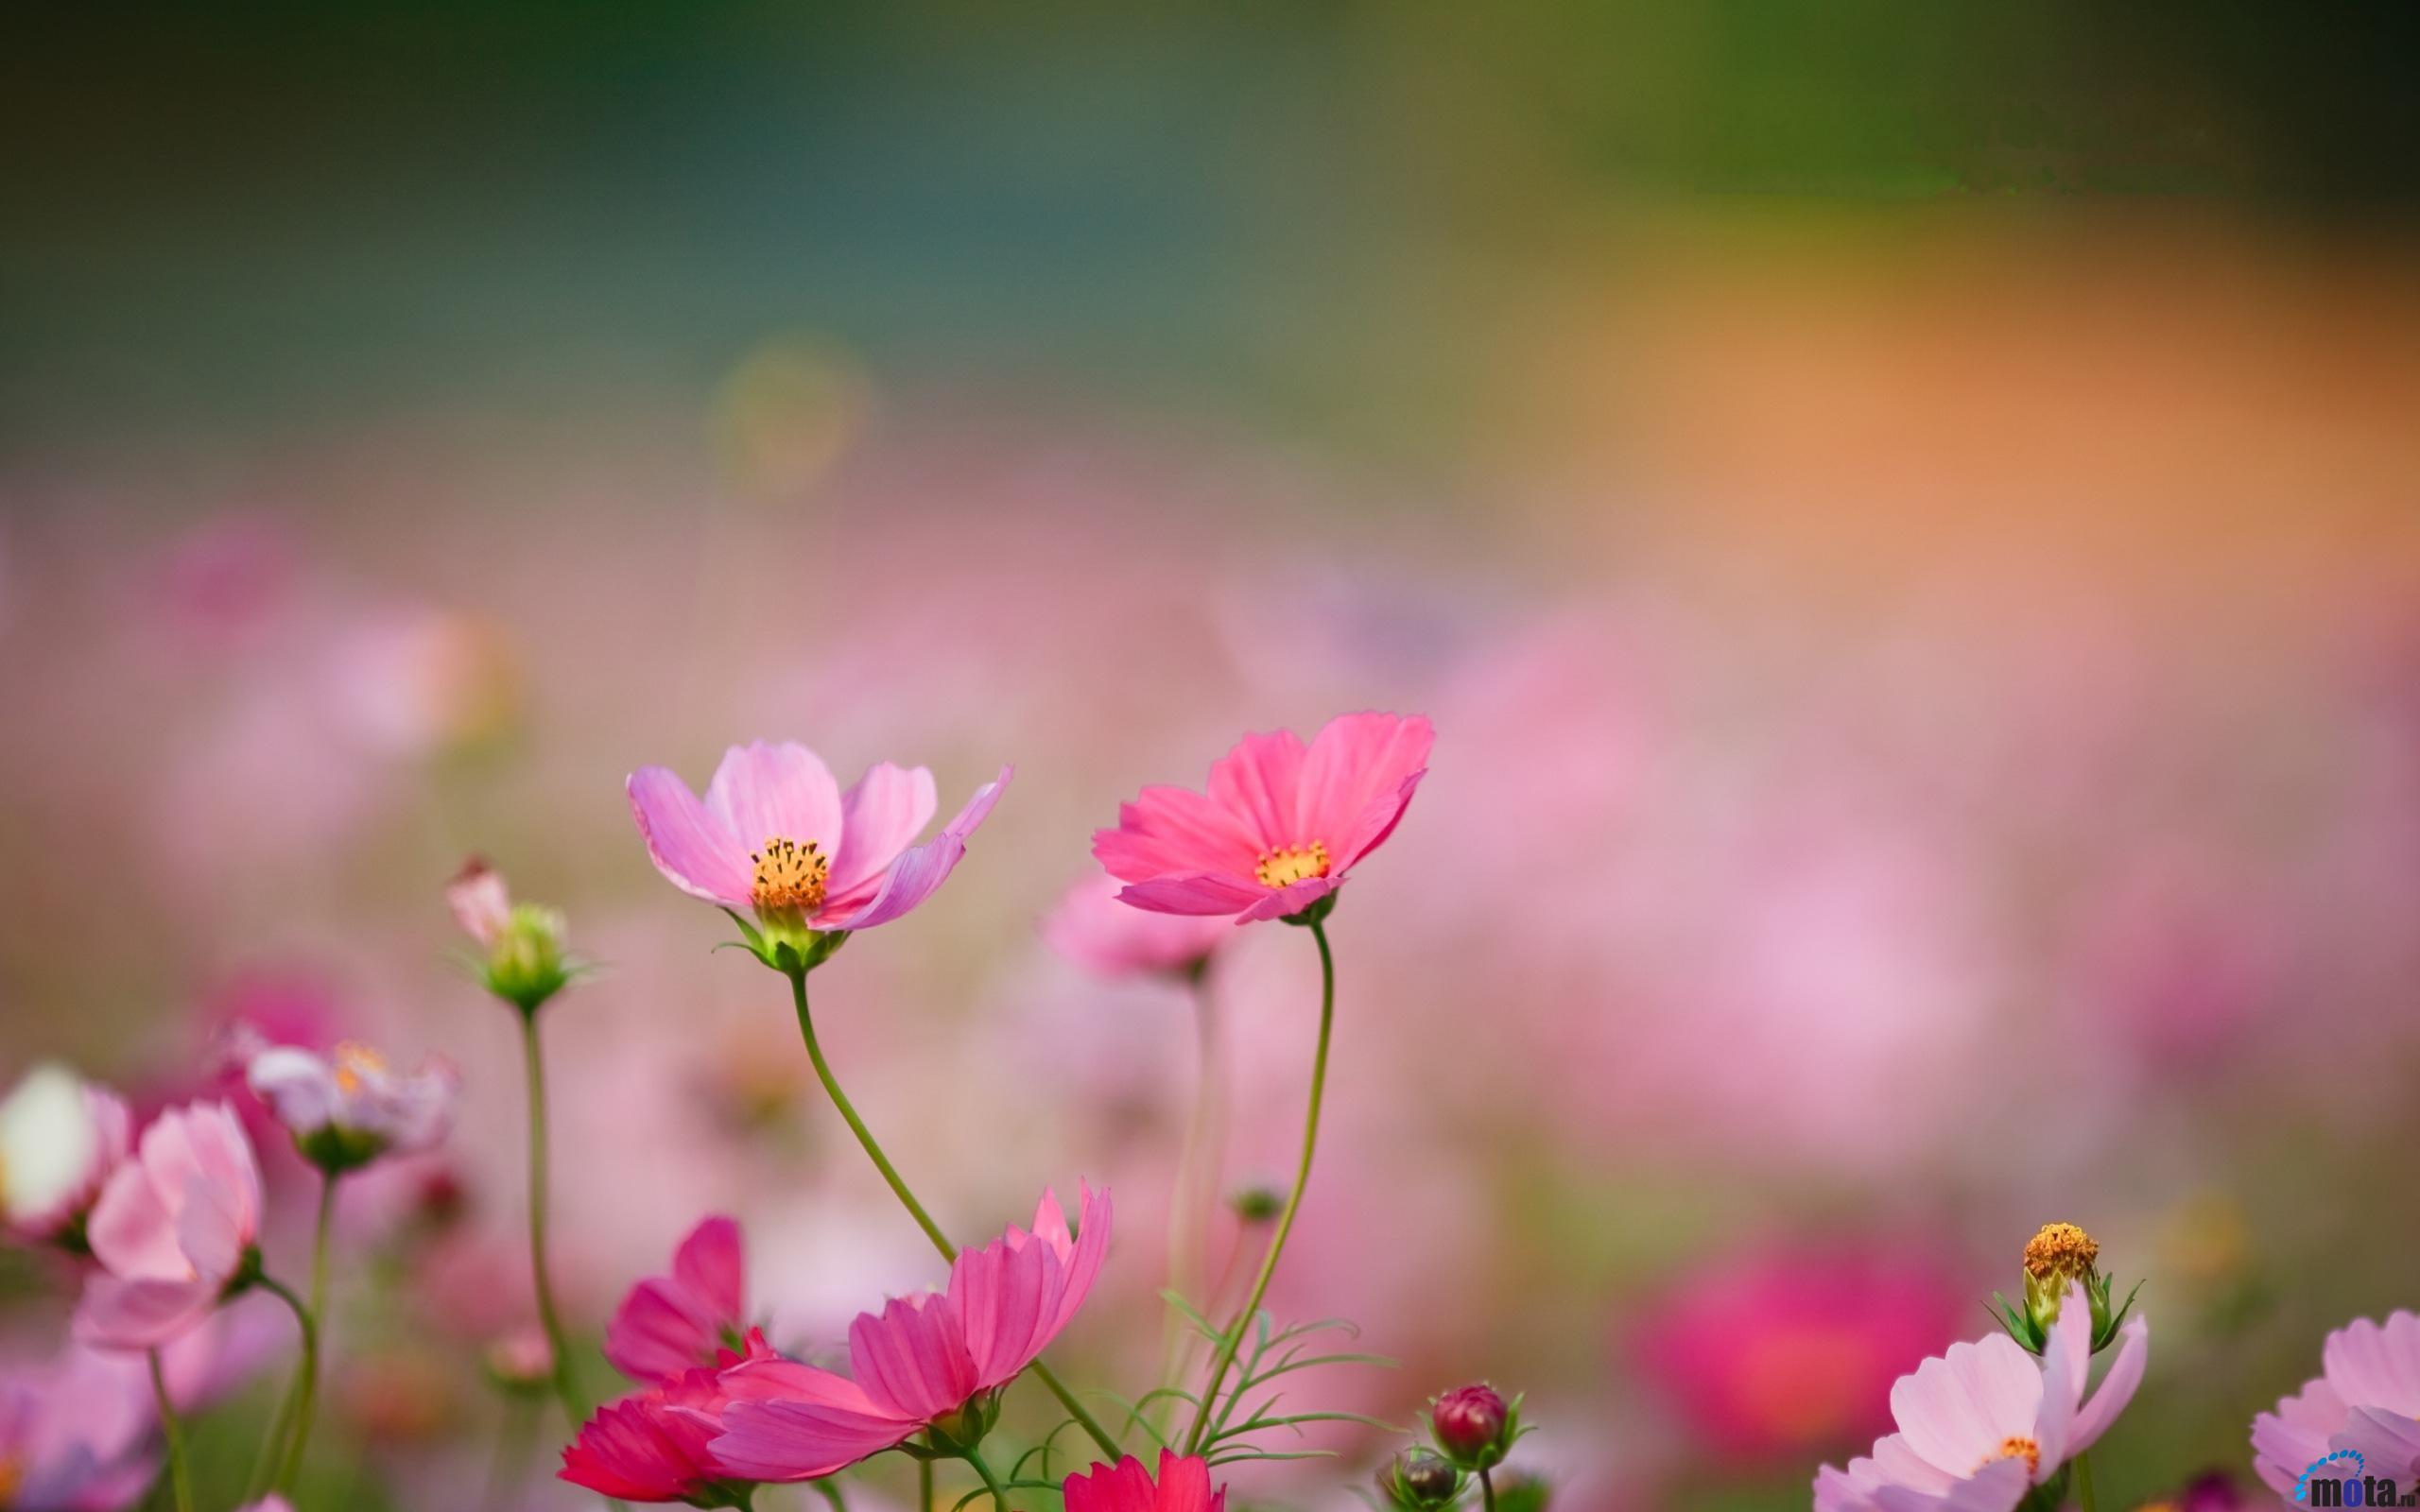 Wild flower wallpaper wallpapersafari - Flower wallpaper movie ...